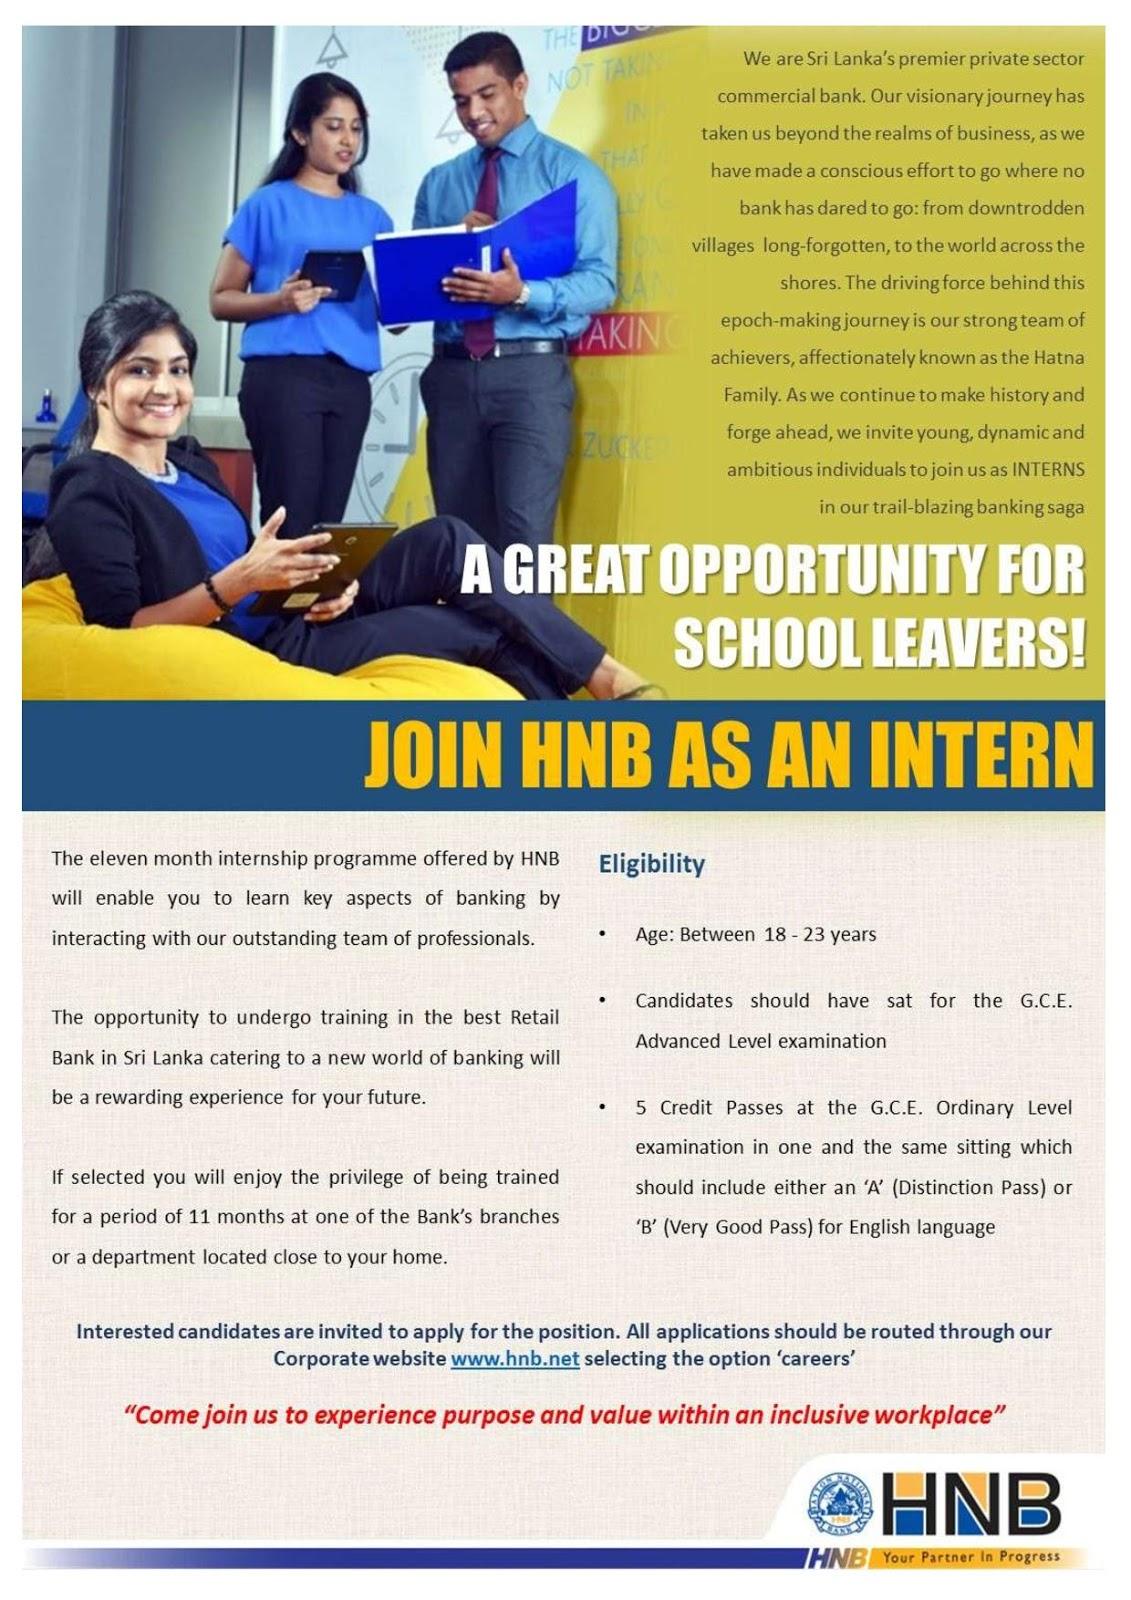 Internship For School Leavers  - Hatton National Bank PLC  Vacancy